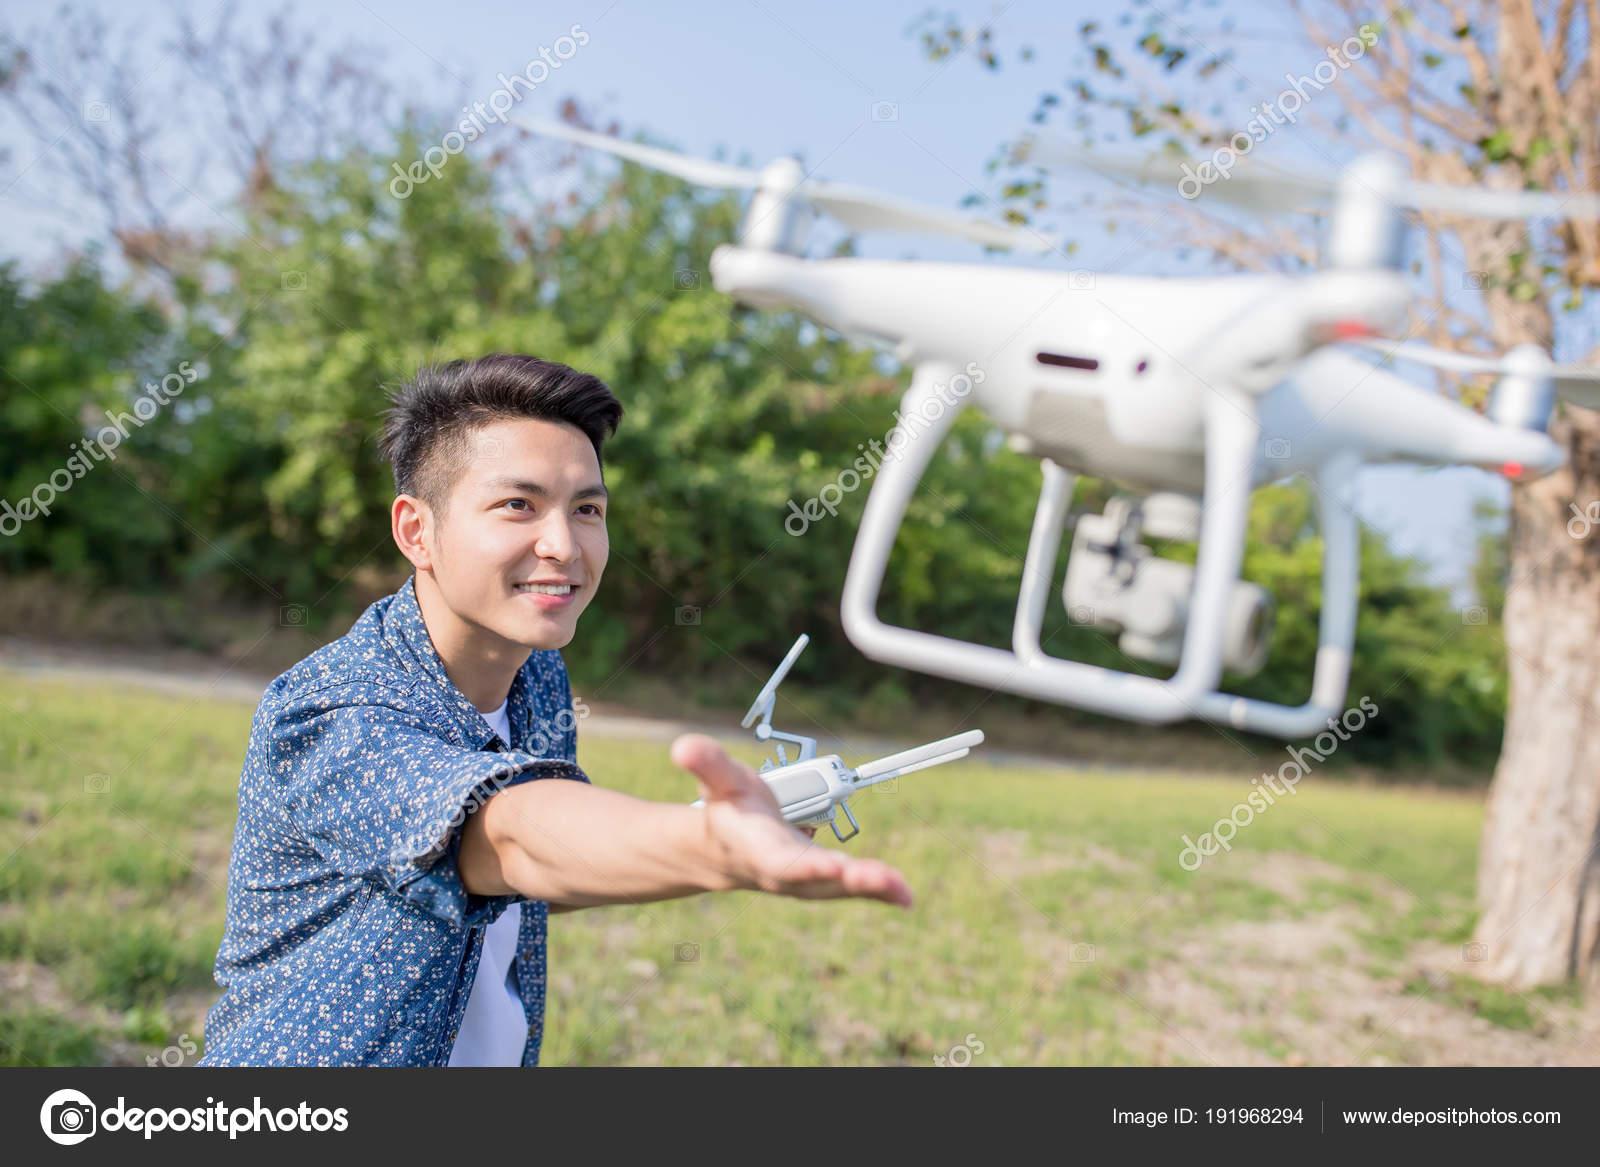 Acheter bebop drone drone camera thermique